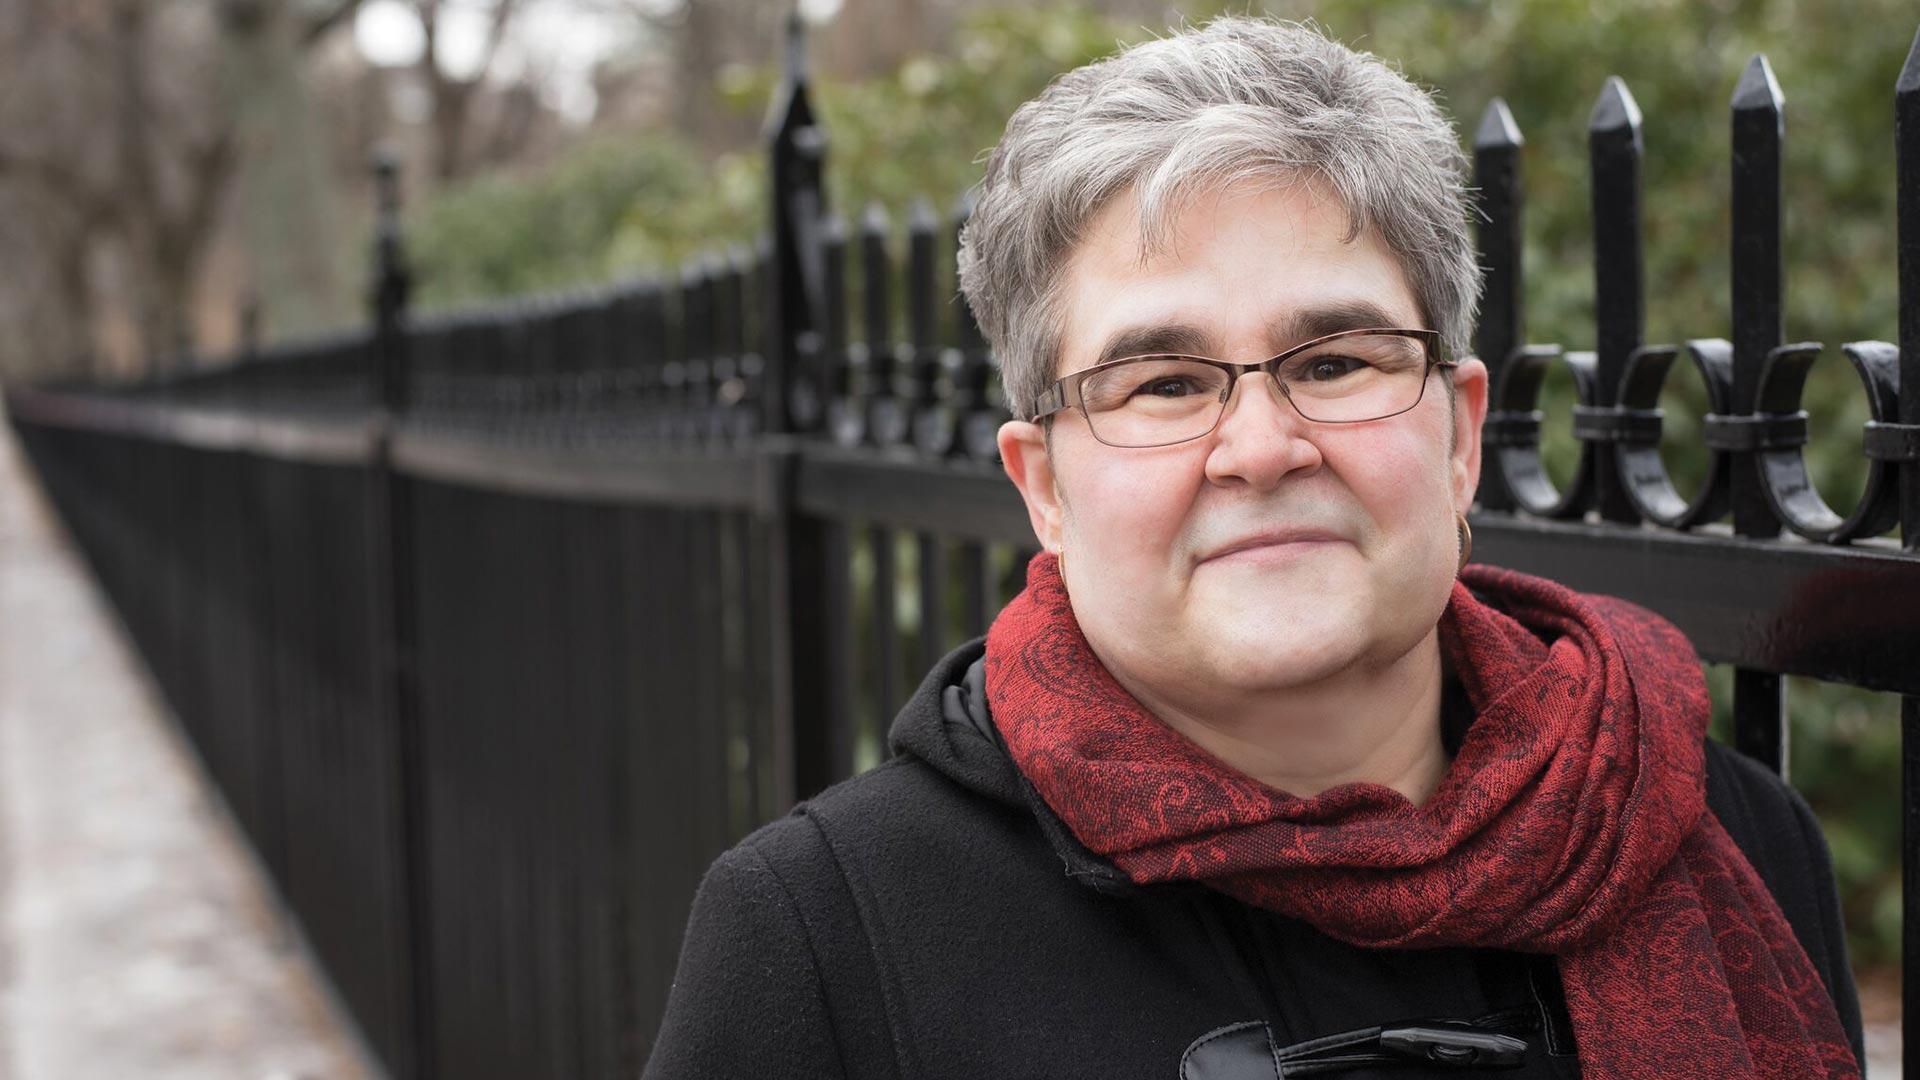 Cheryl MacKenize, stroke and heart attack survivor